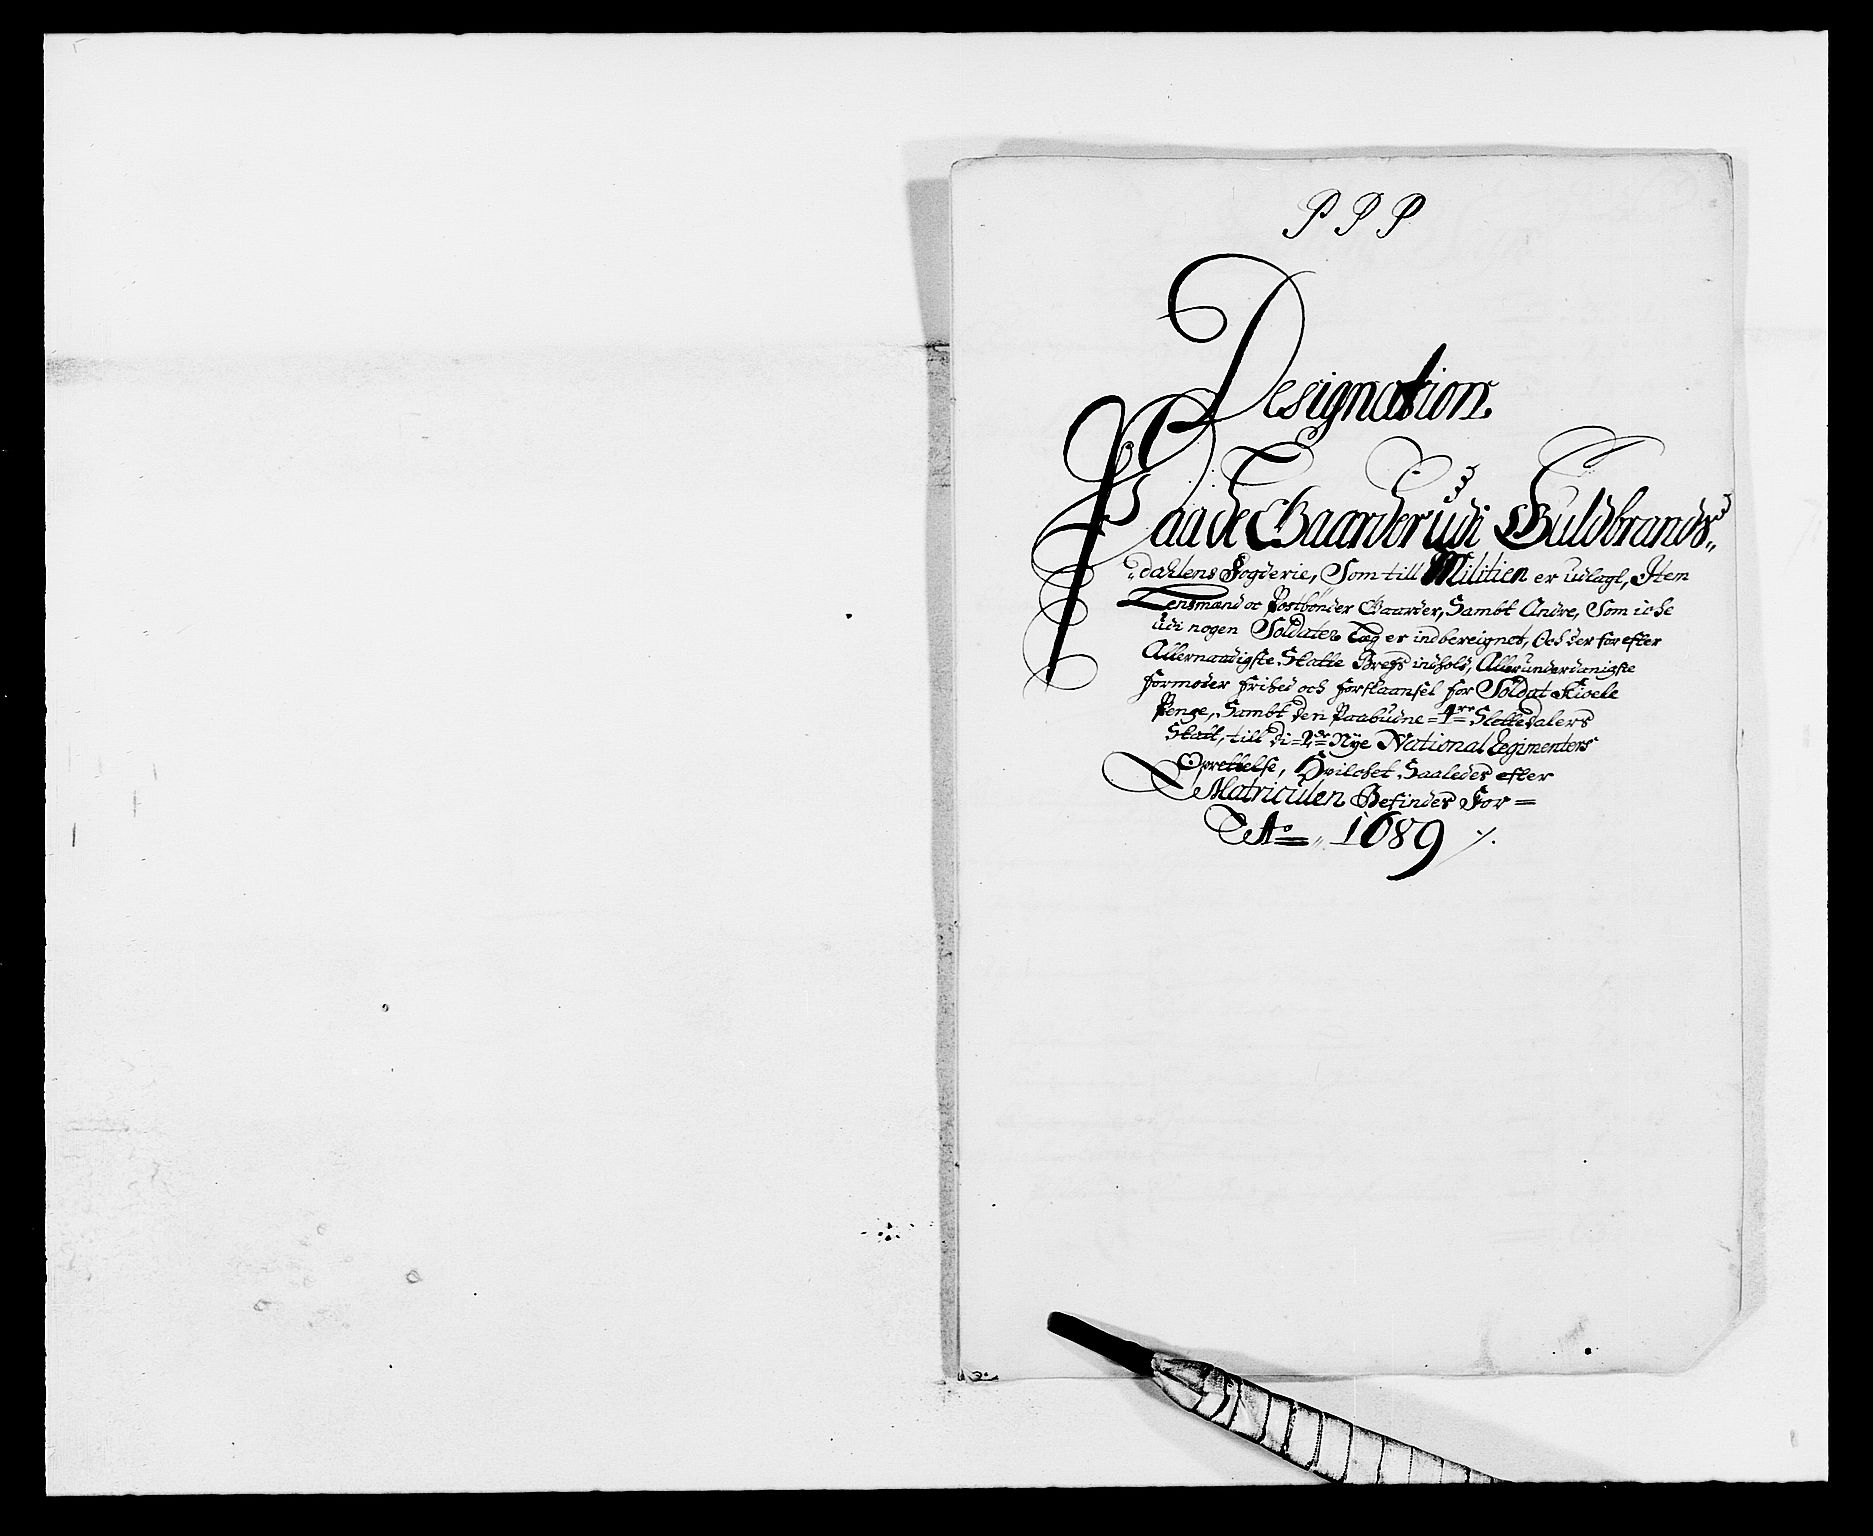 RA, Rentekammeret inntil 1814, Reviderte regnskaper, Fogderegnskap, R17/L1164: Fogderegnskap Gudbrandsdal, 1682-1689, s. 130